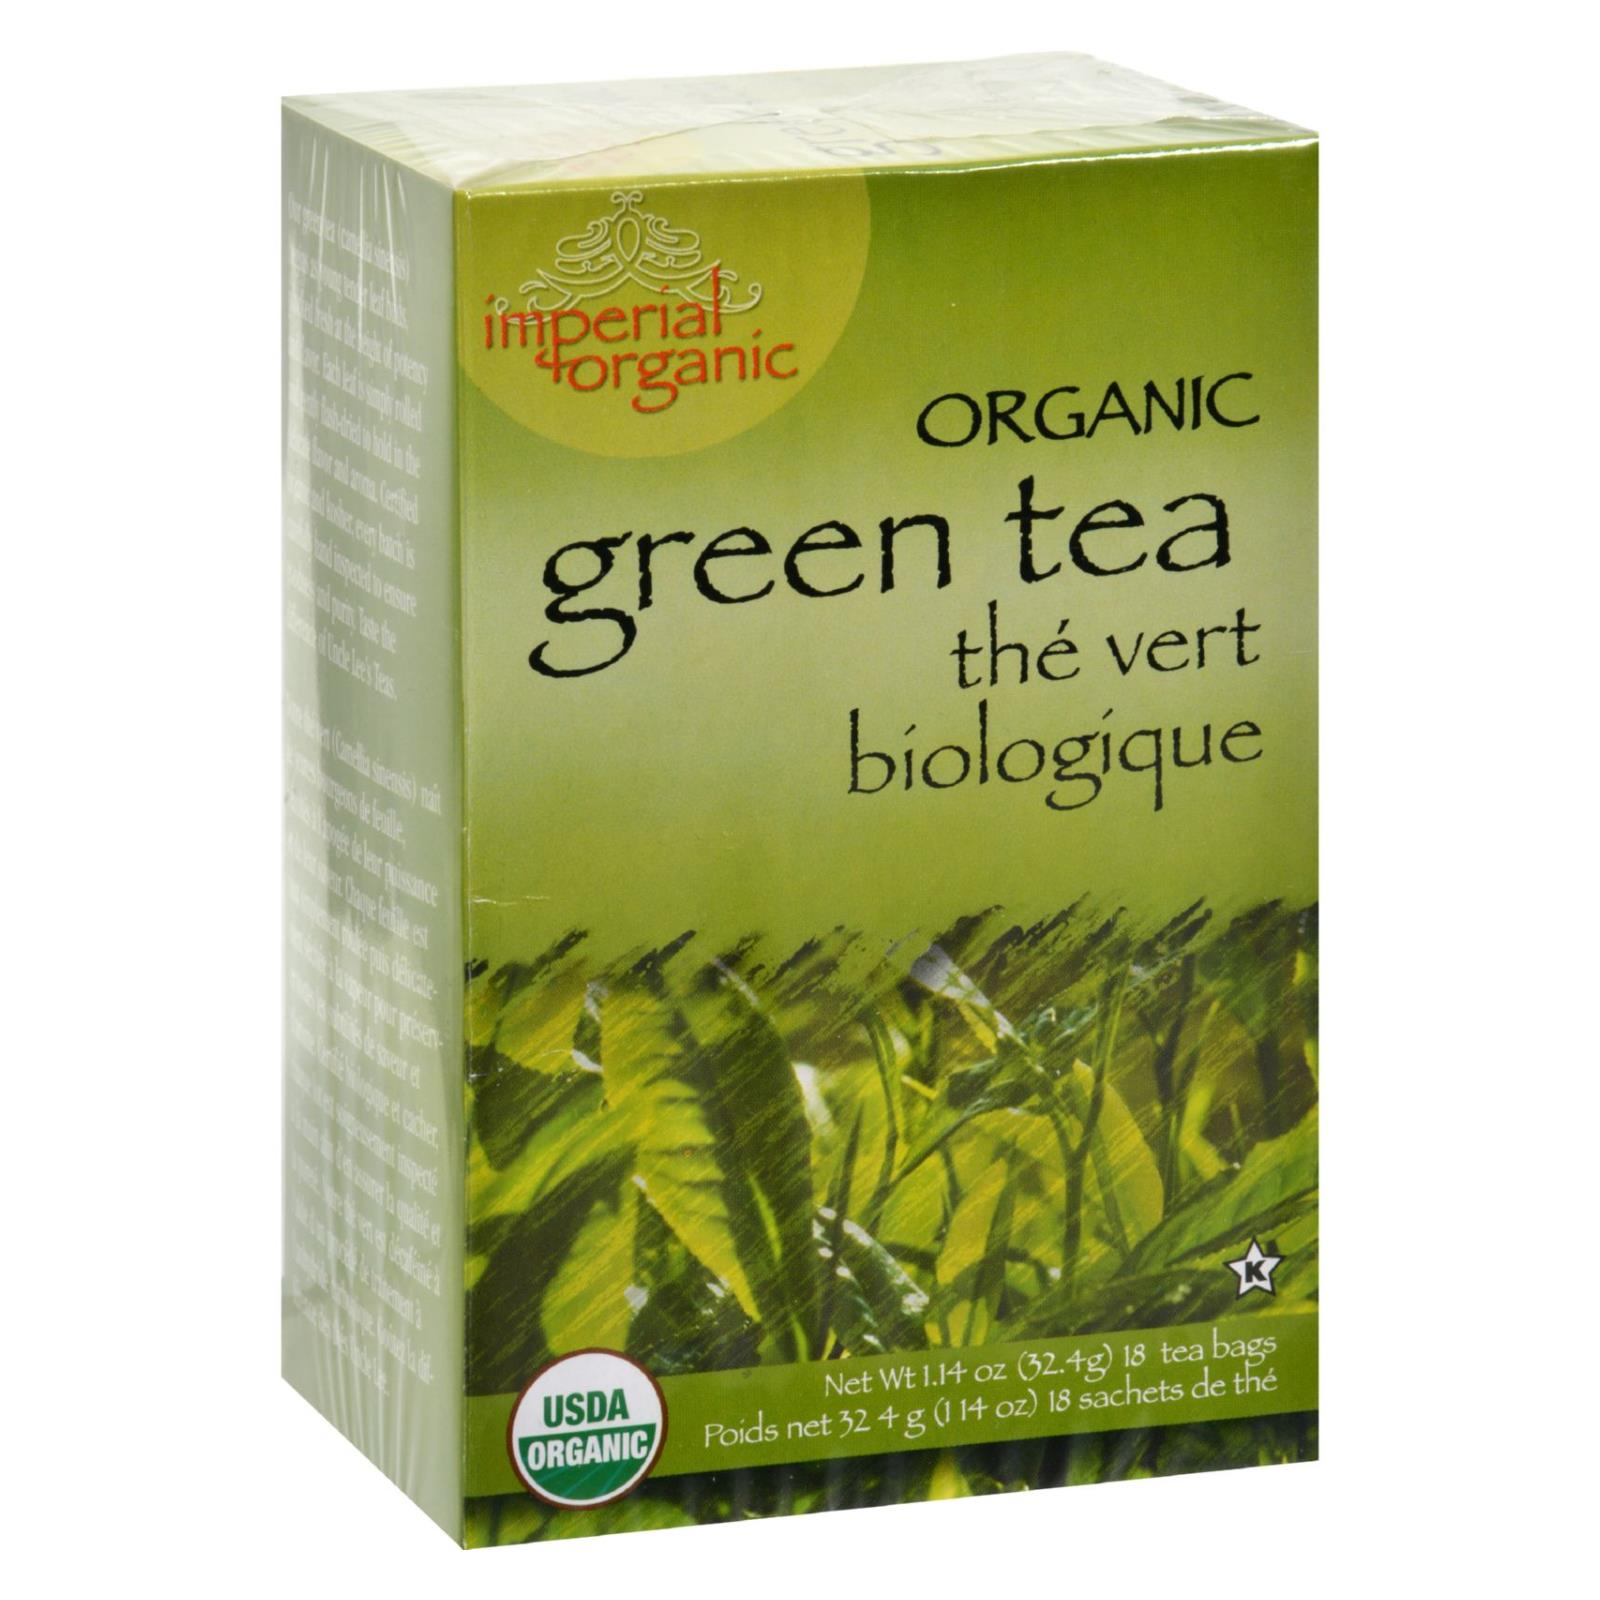 Uncle Lee's Imperial Organic Green Tea - 18 Tea Bags